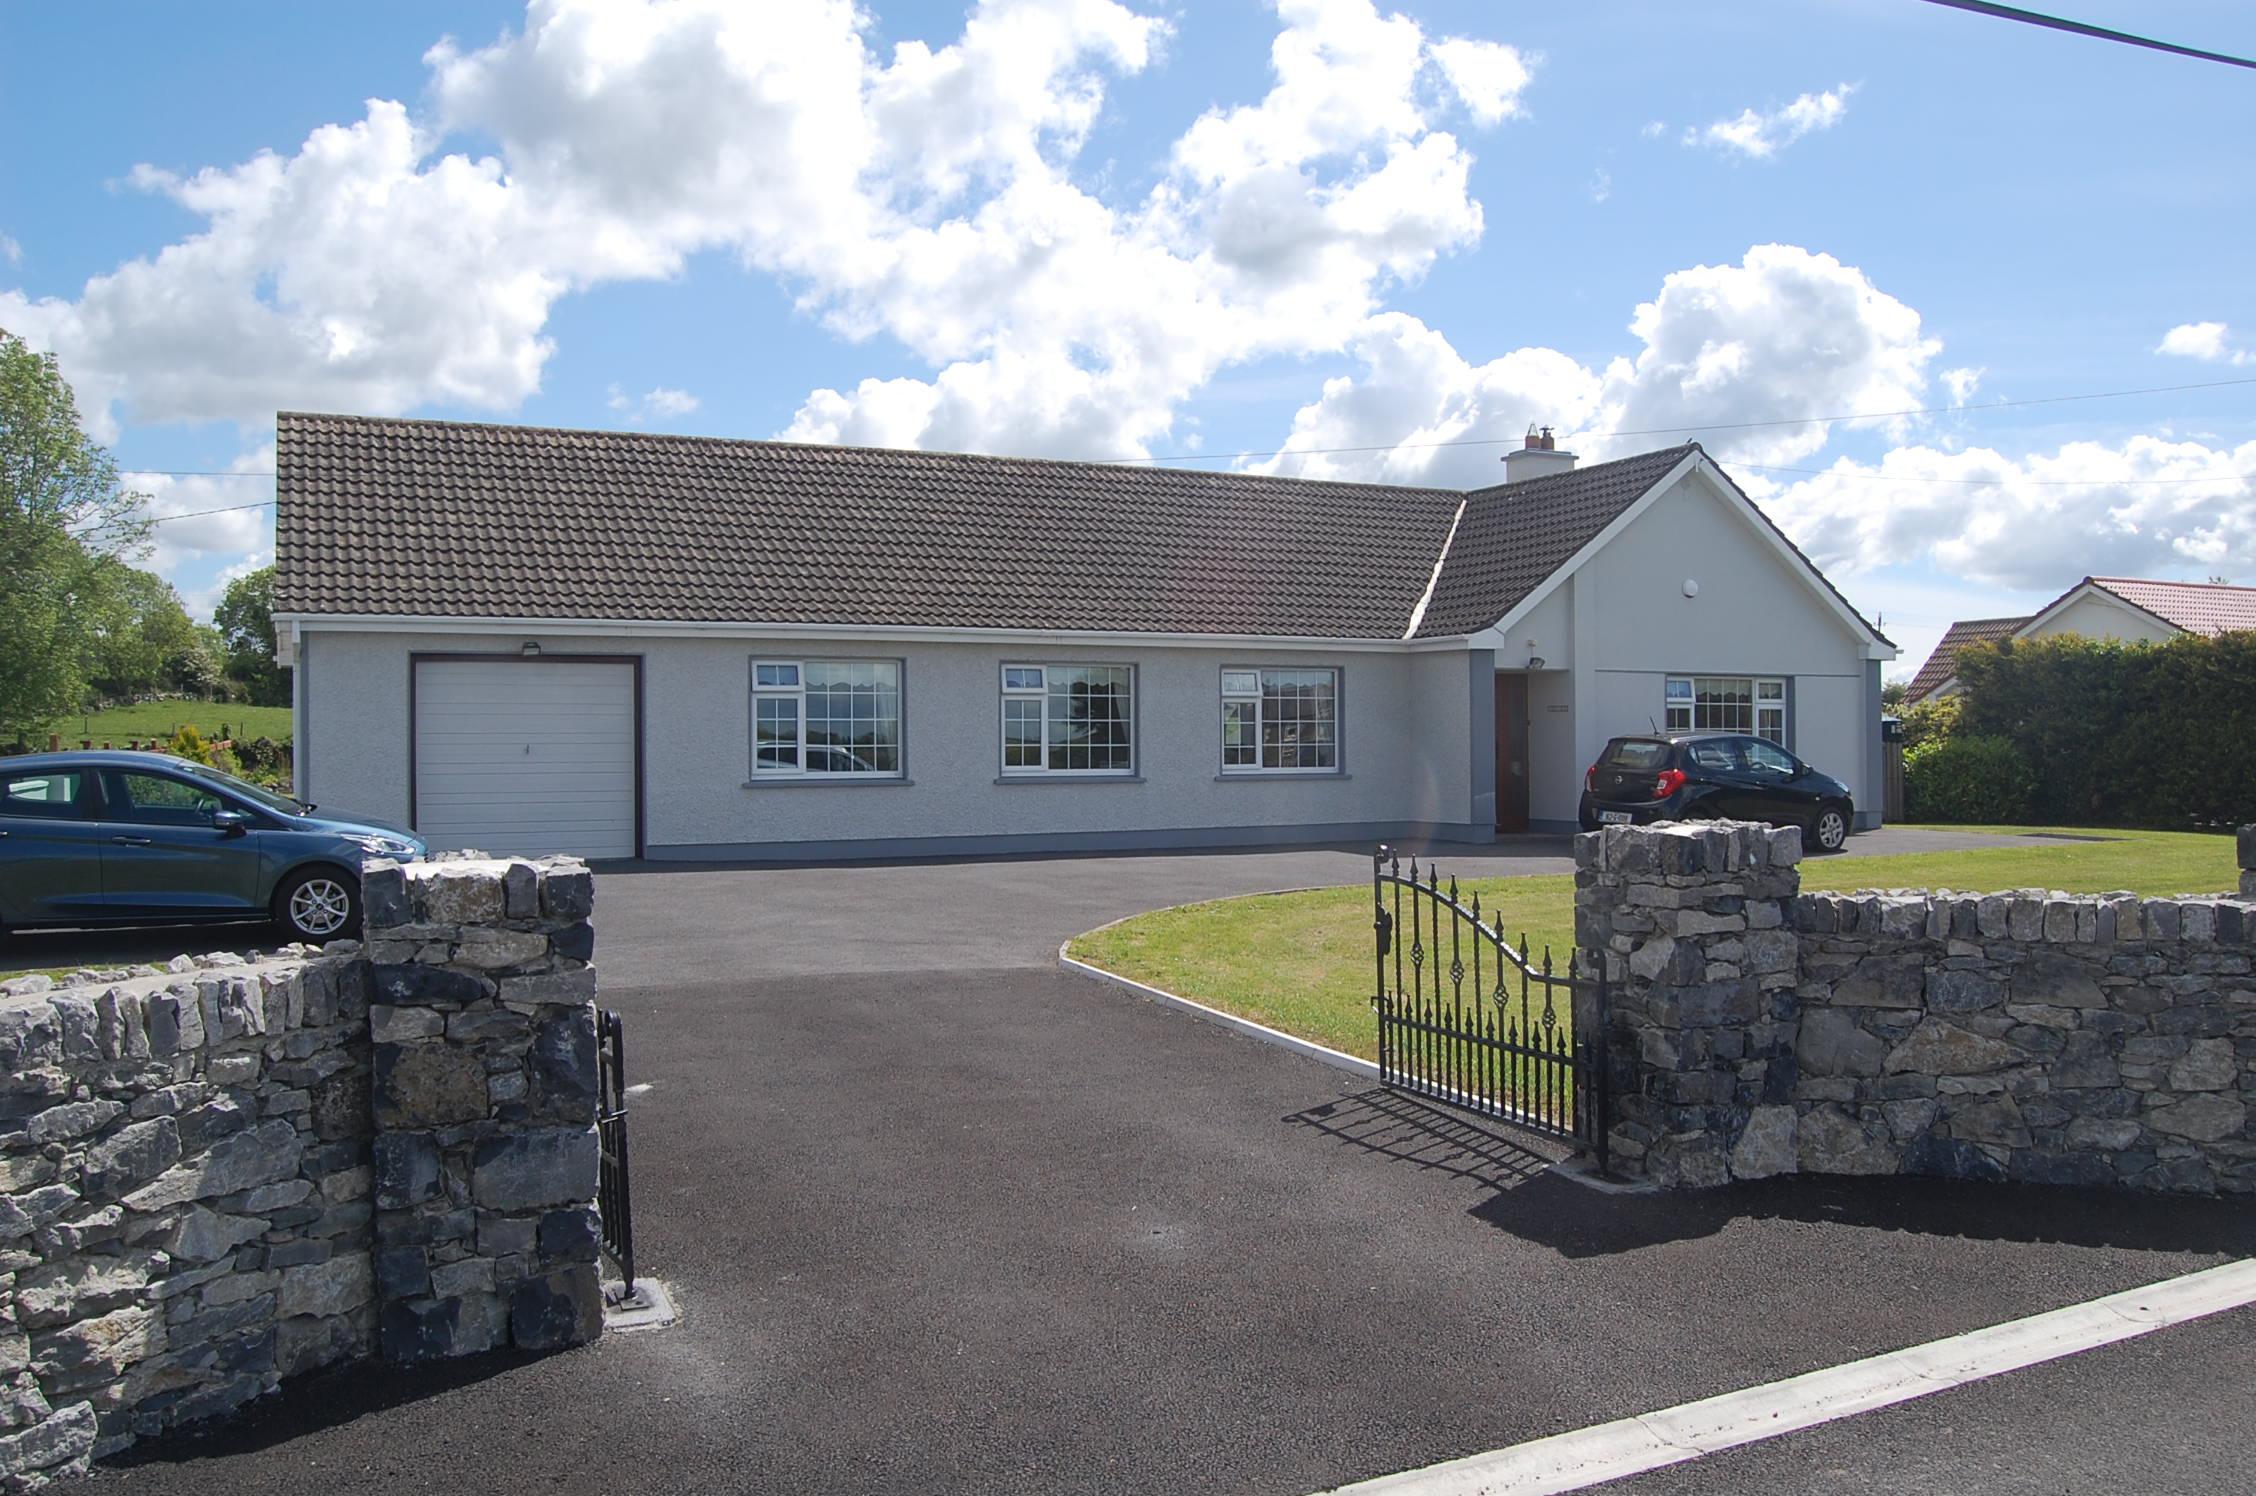 Abbey Road, Abbeyknockmoy, Co Galway, Abbeyknockmoy, Co. Galway Eircode: H54 FX43